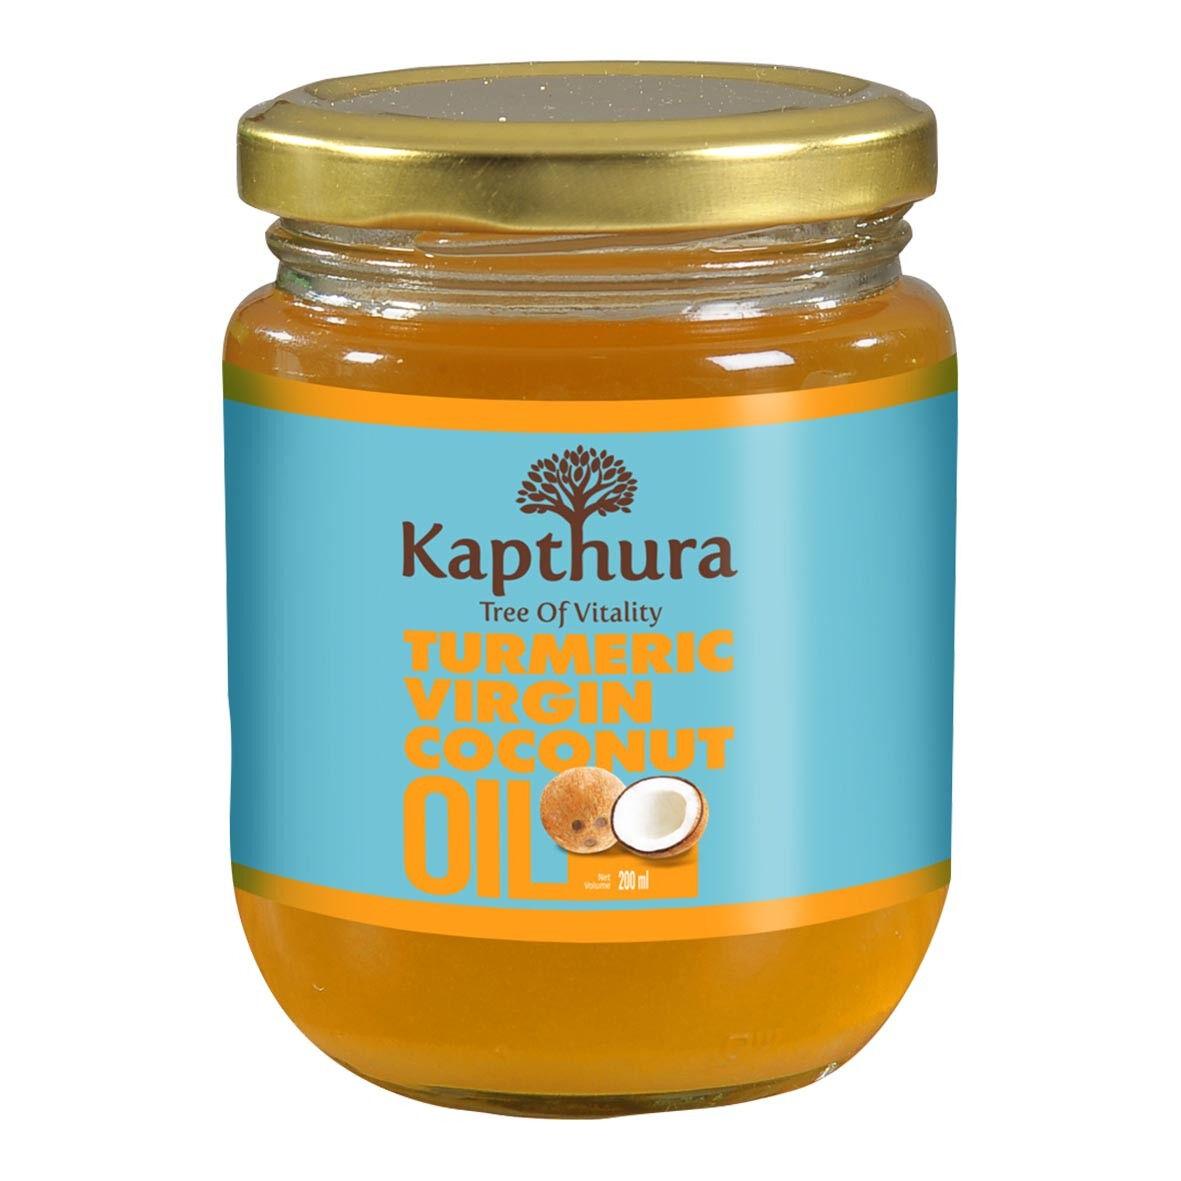 Lechoppebio Huile de Coco infusée au Curcuma Bio 200 ml - Kapthura